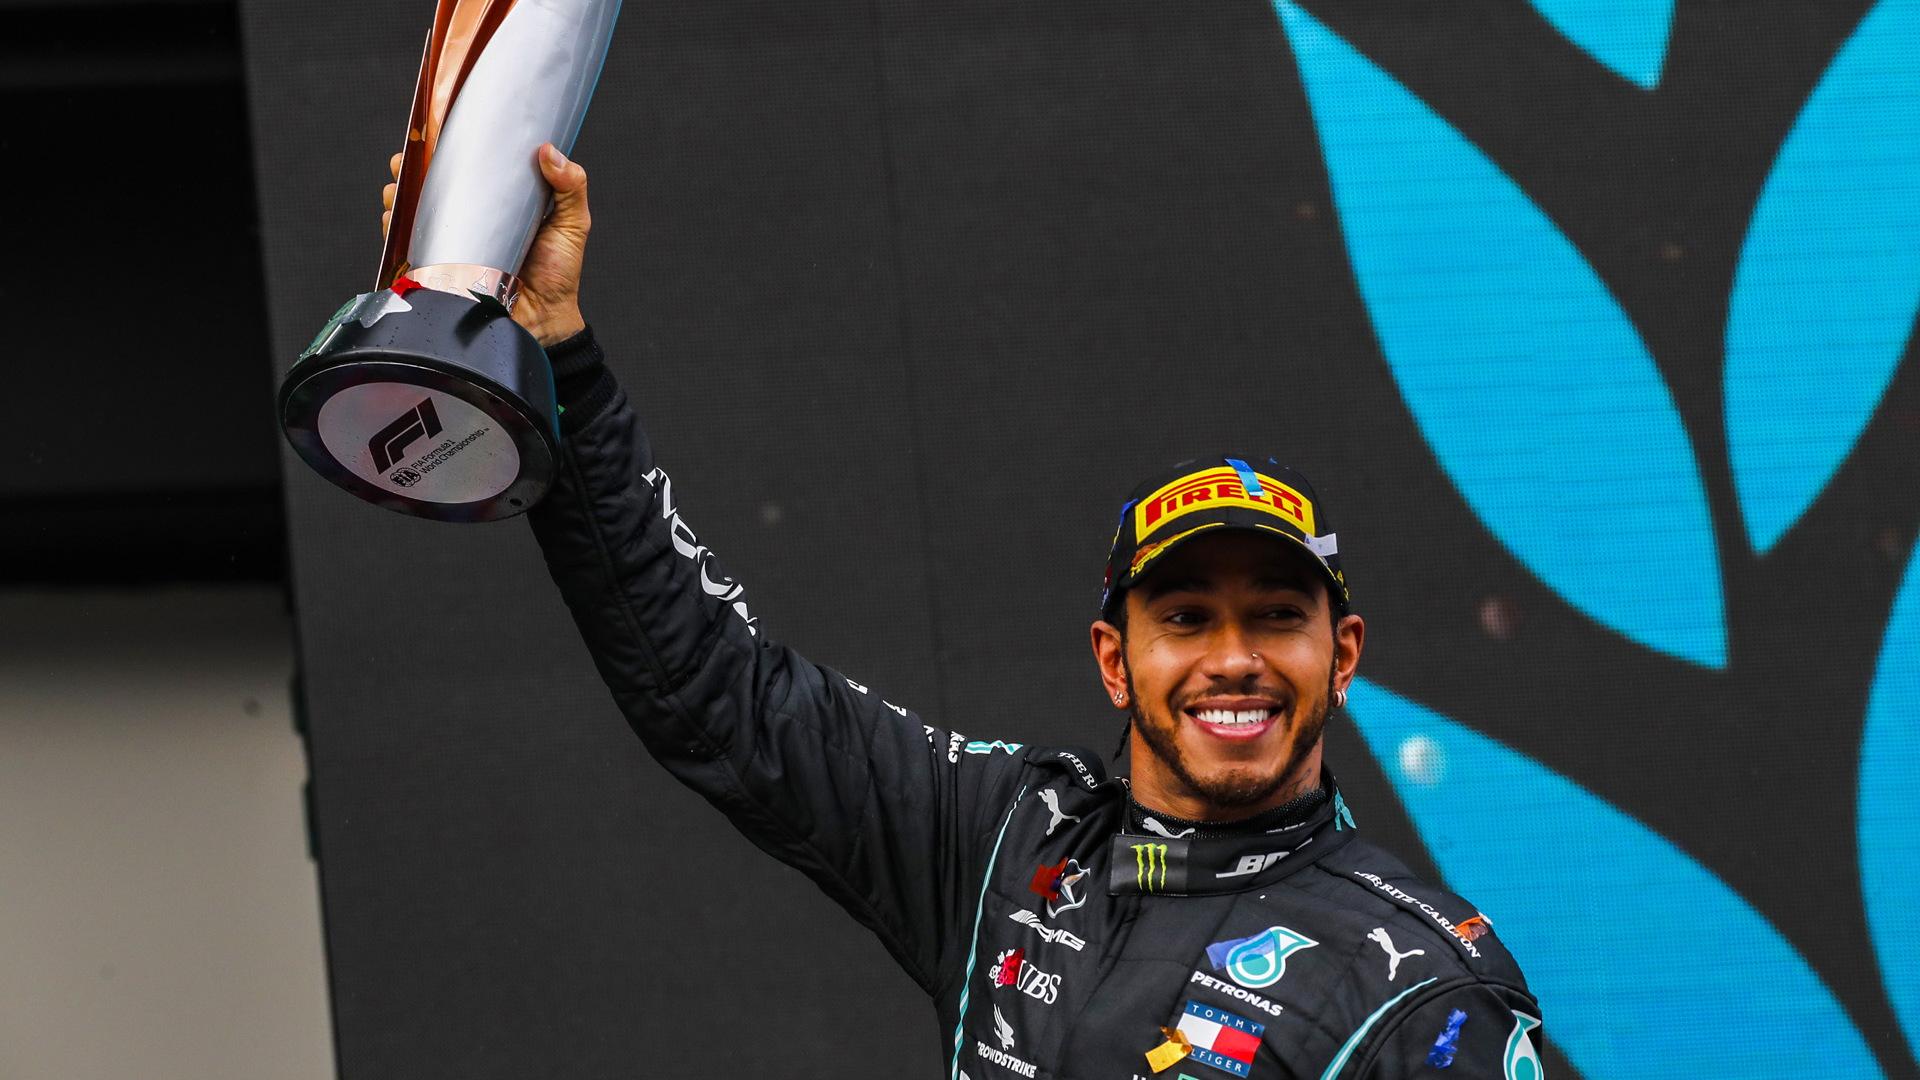 Mercedes-AMG's Lewis Hamilton at the 2020 Formula One Turkish Grand Prix